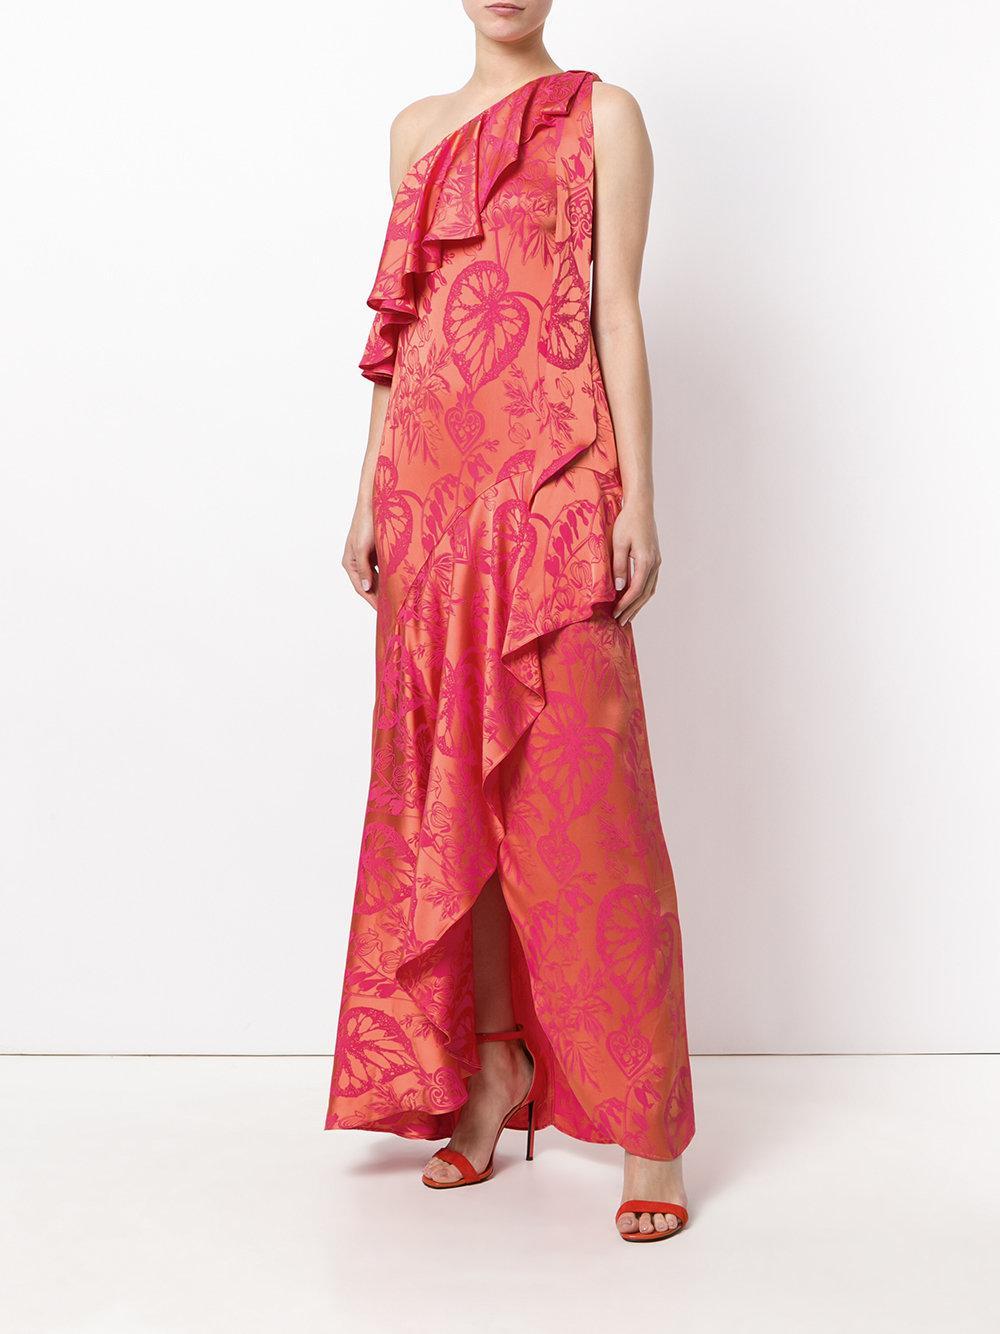 Orbit ruffle dress - Yellow & Orange Temperley London YQRx82mye